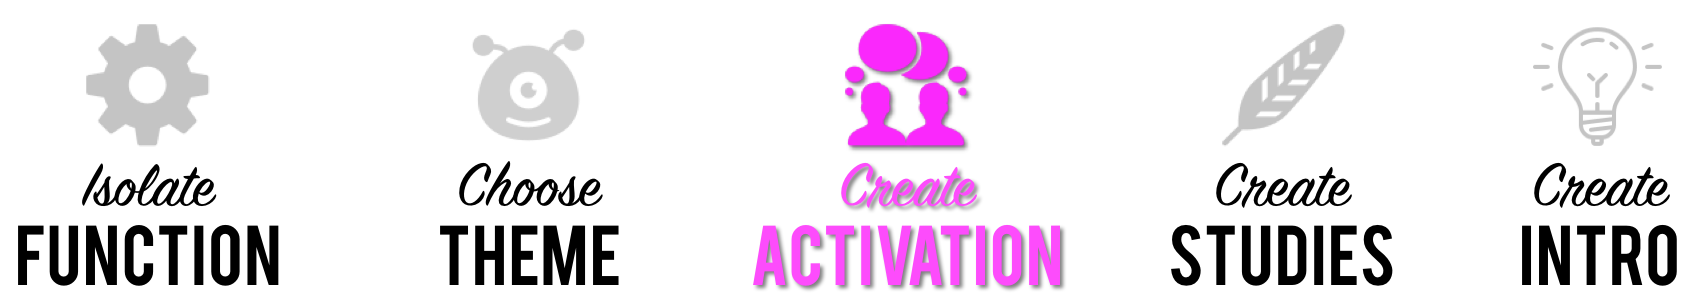 Lesson Plans for English teachers_activation.png